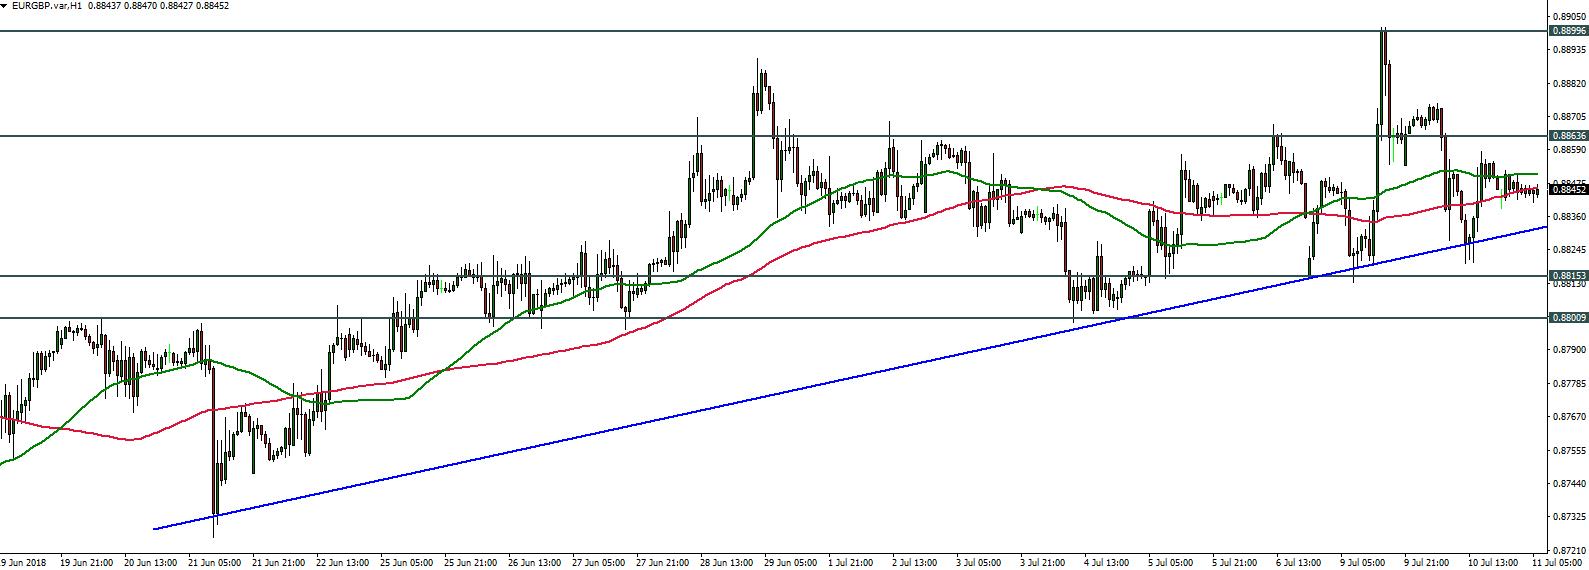 EURGBP - 11.07.2018